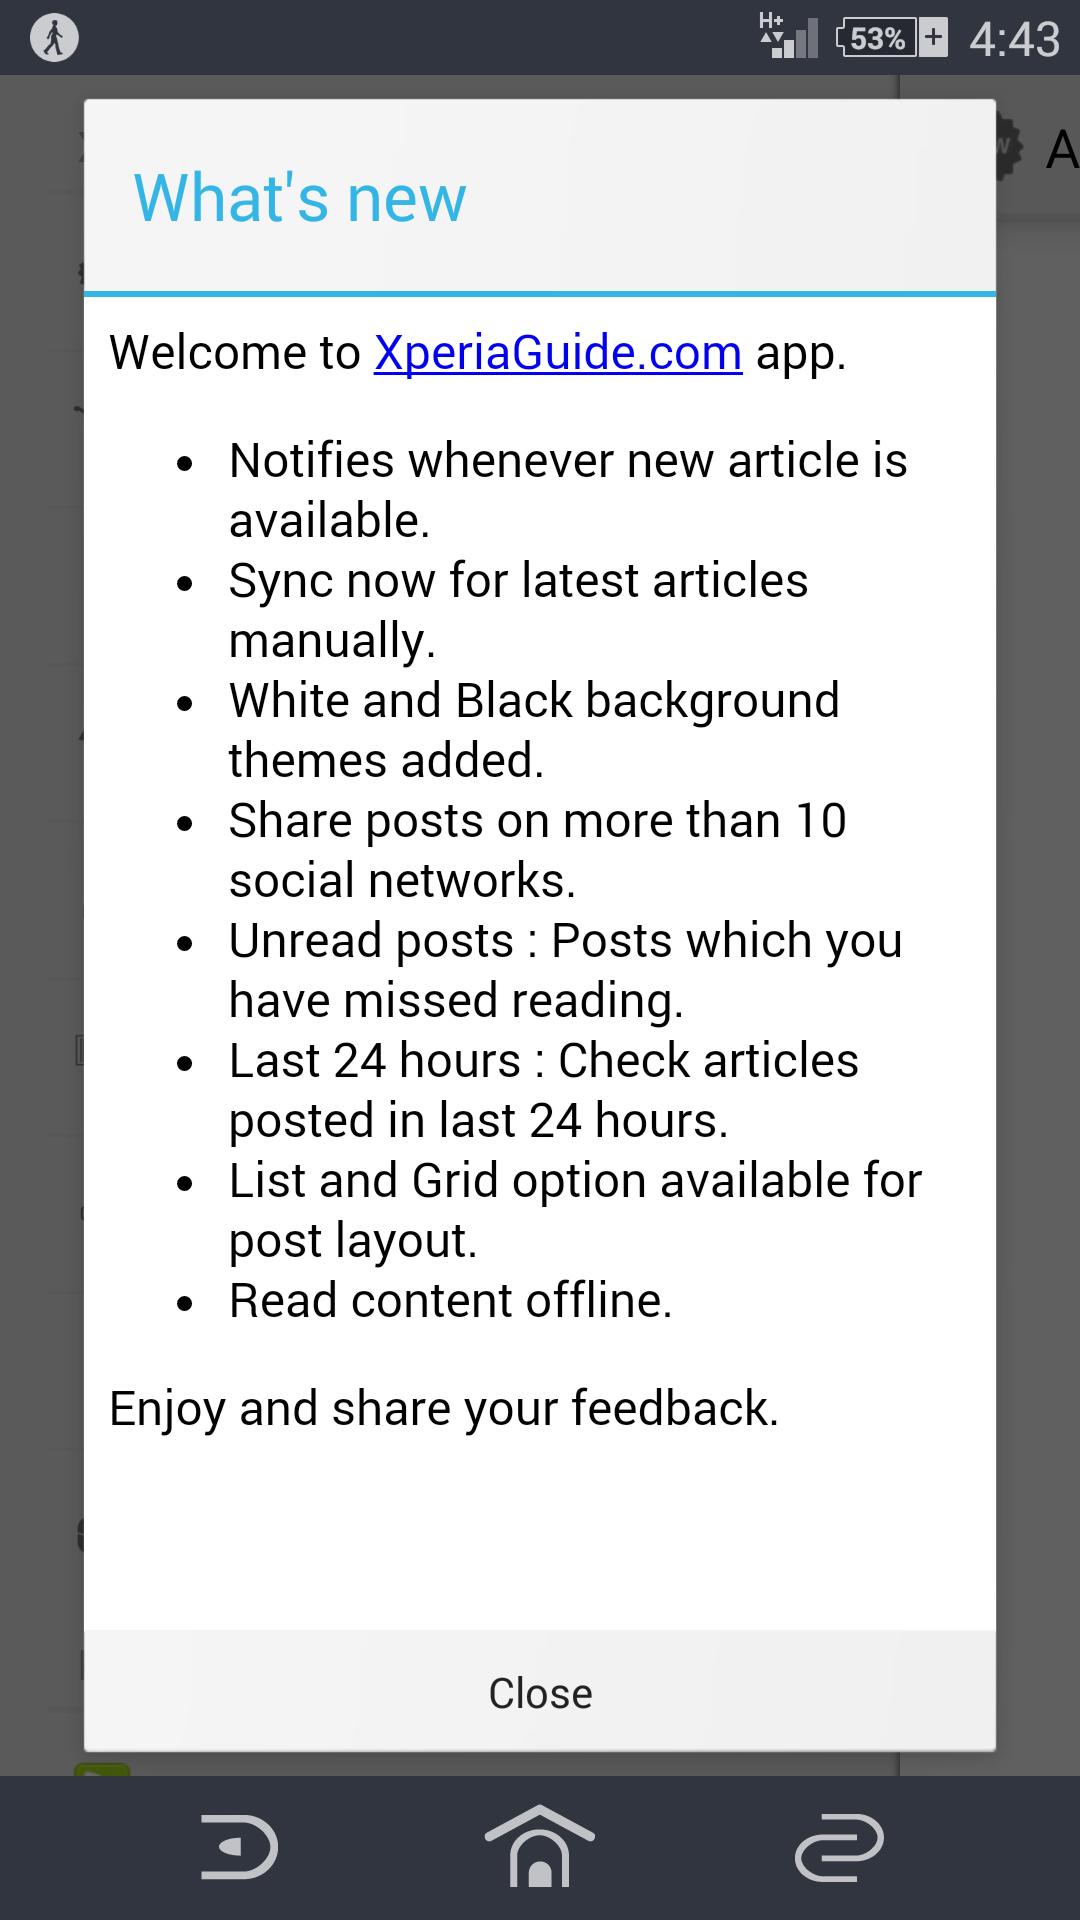 Xperia Guide app